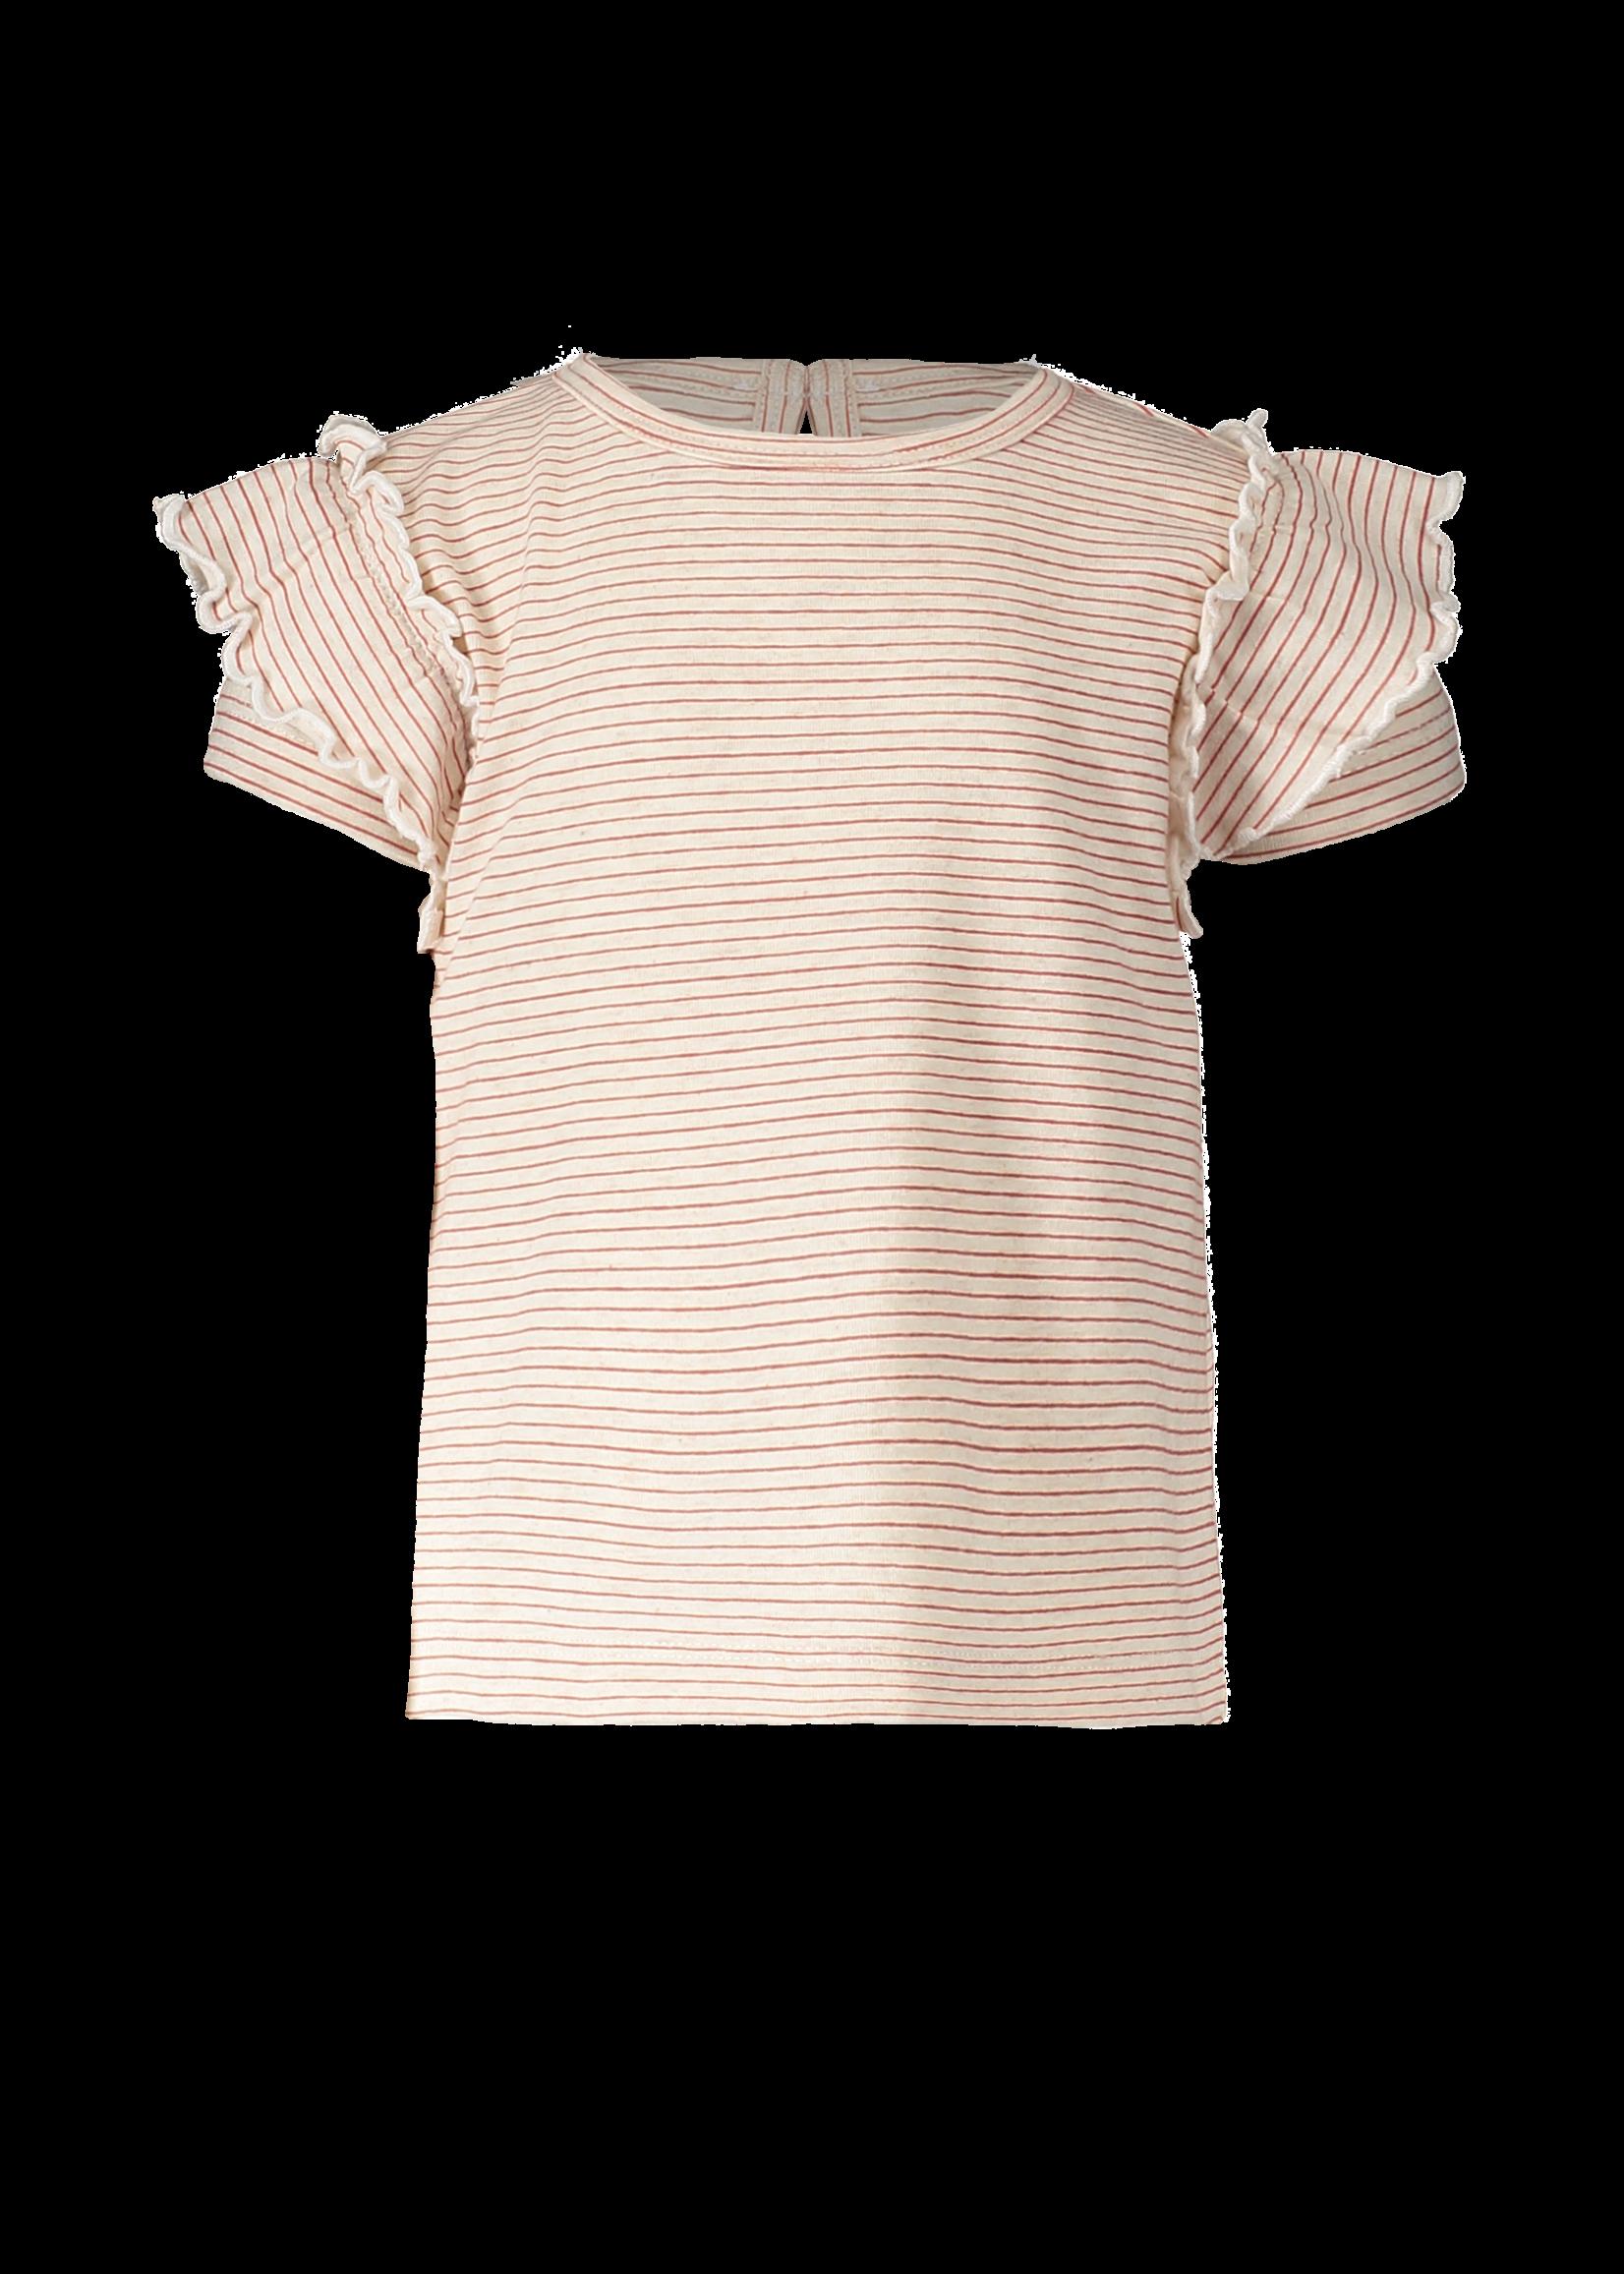 Pexi Lexi PL - Shirt Ruffle - Stripe